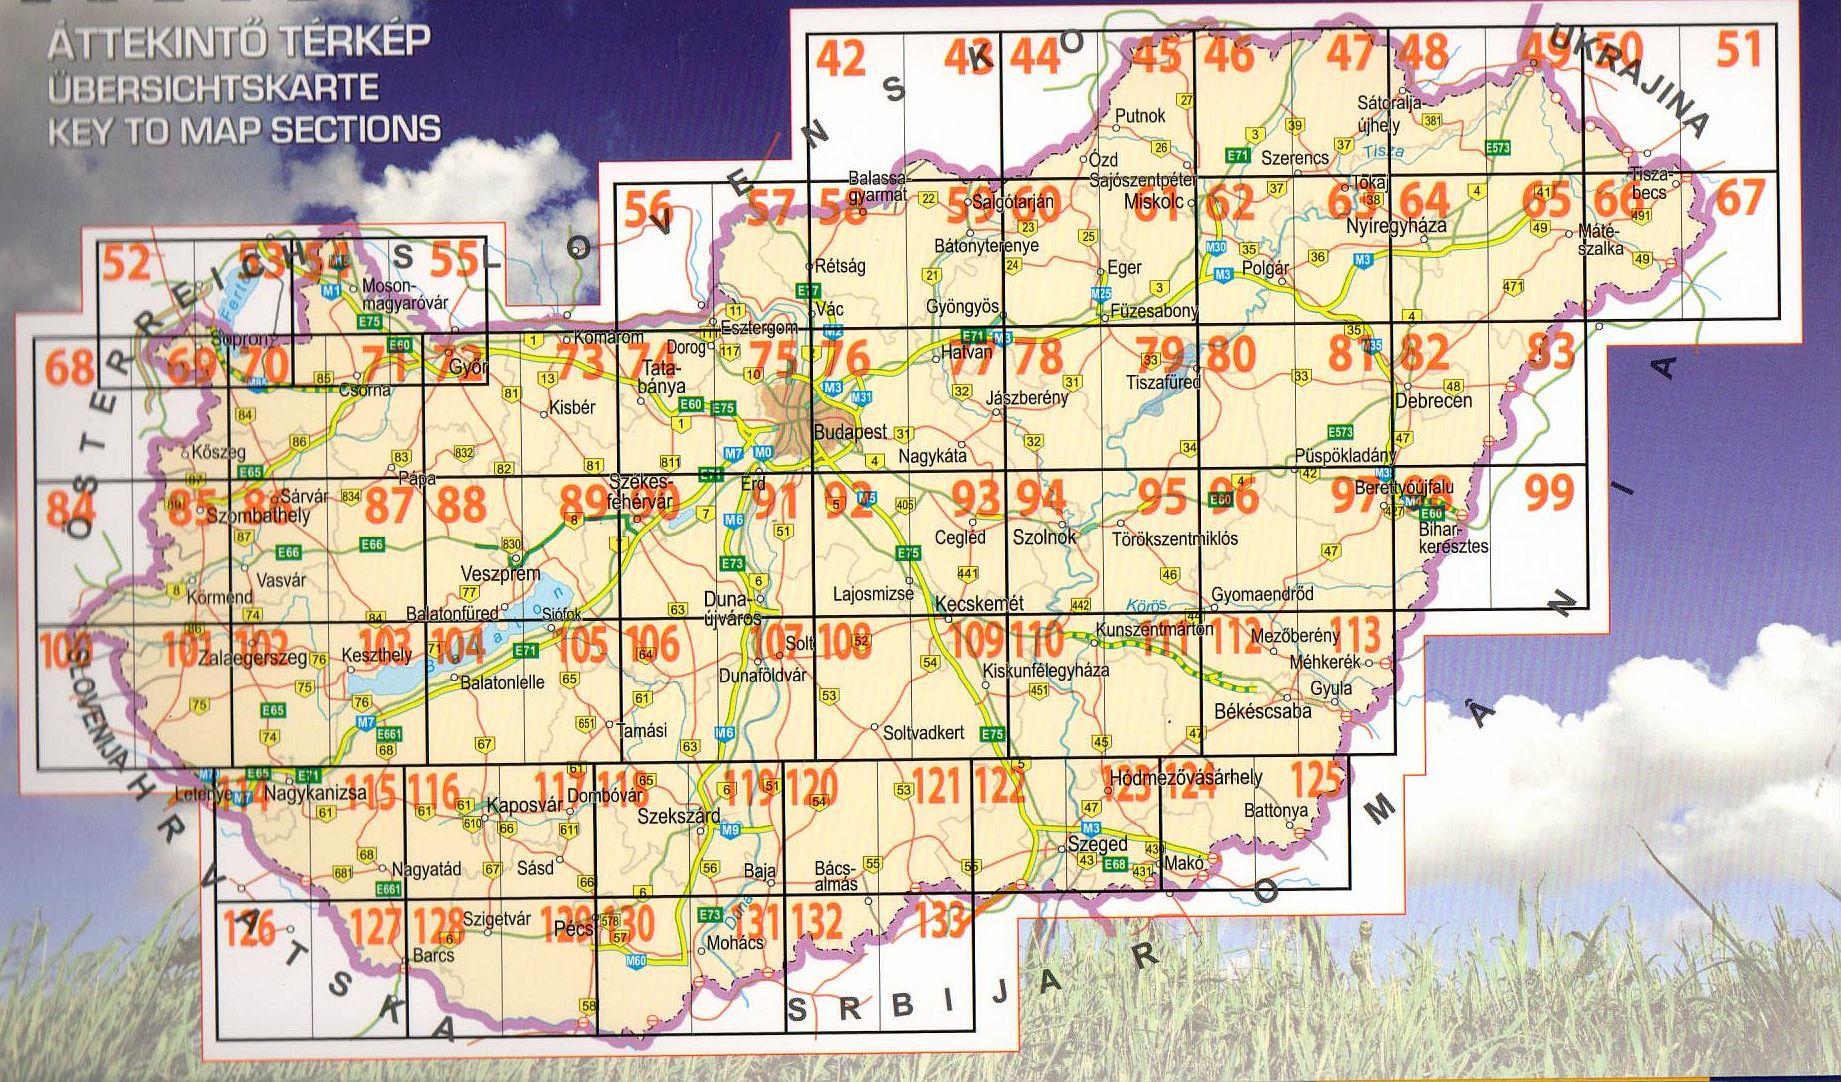 Hungary cycling guide/atlas: map sheet reference